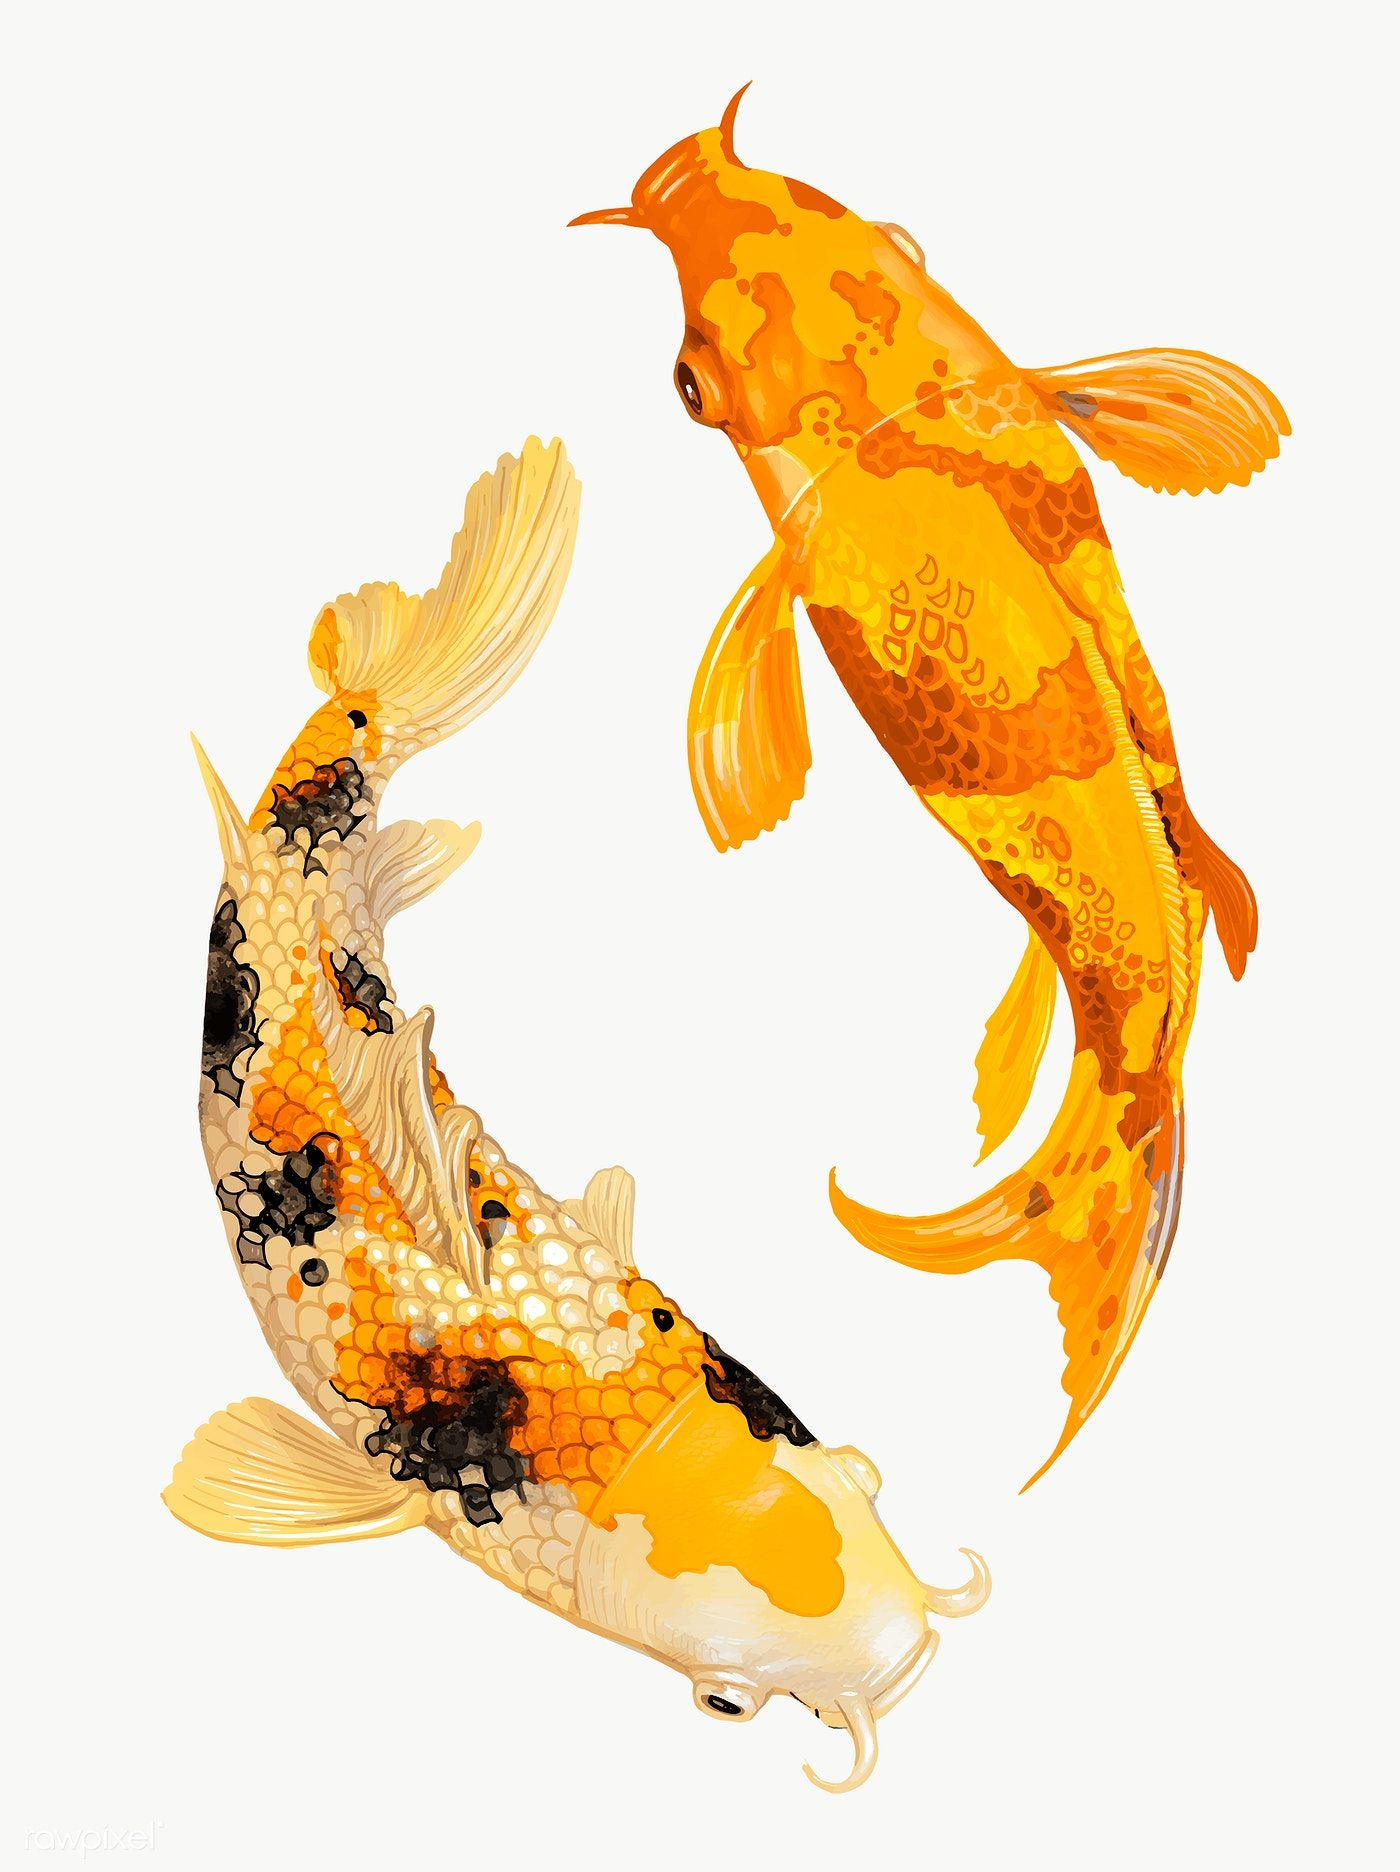 Two Japanese Koi Fish Swimming Transparent Png Premium Image By Rawpixel Com Techi Japanese Koi Koi Watercolor Japanese Koi Fish Tattoo